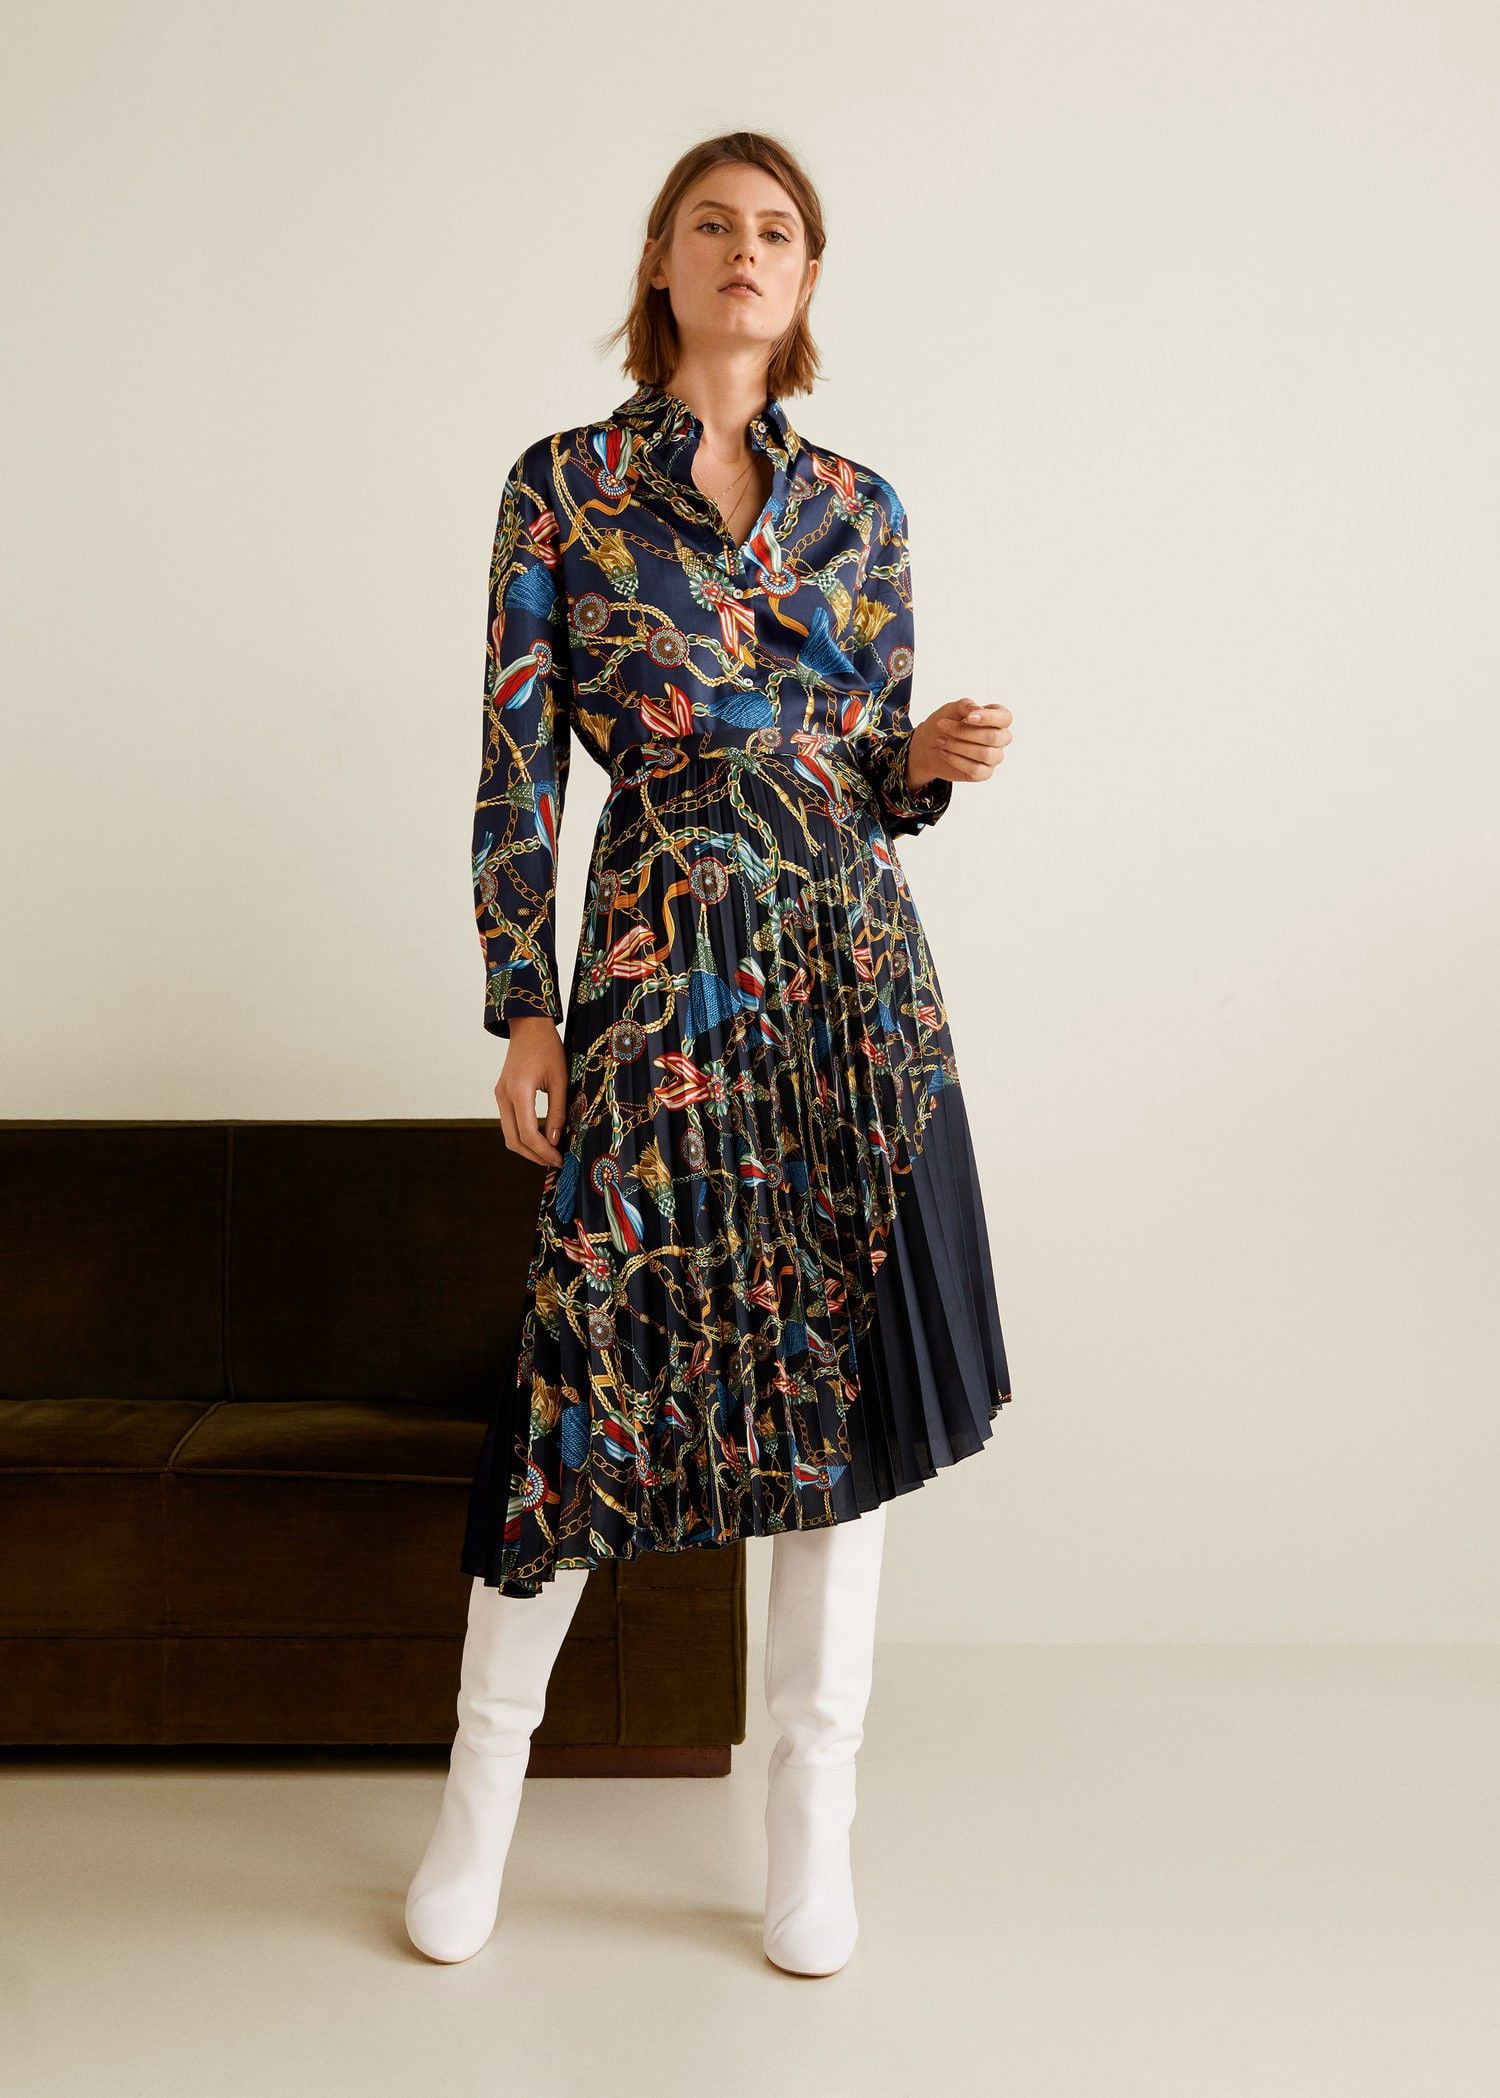 2b2e804e6 Mango Scarf Print Pleated Skirt - XXS in 2019   Products   Pleated ...